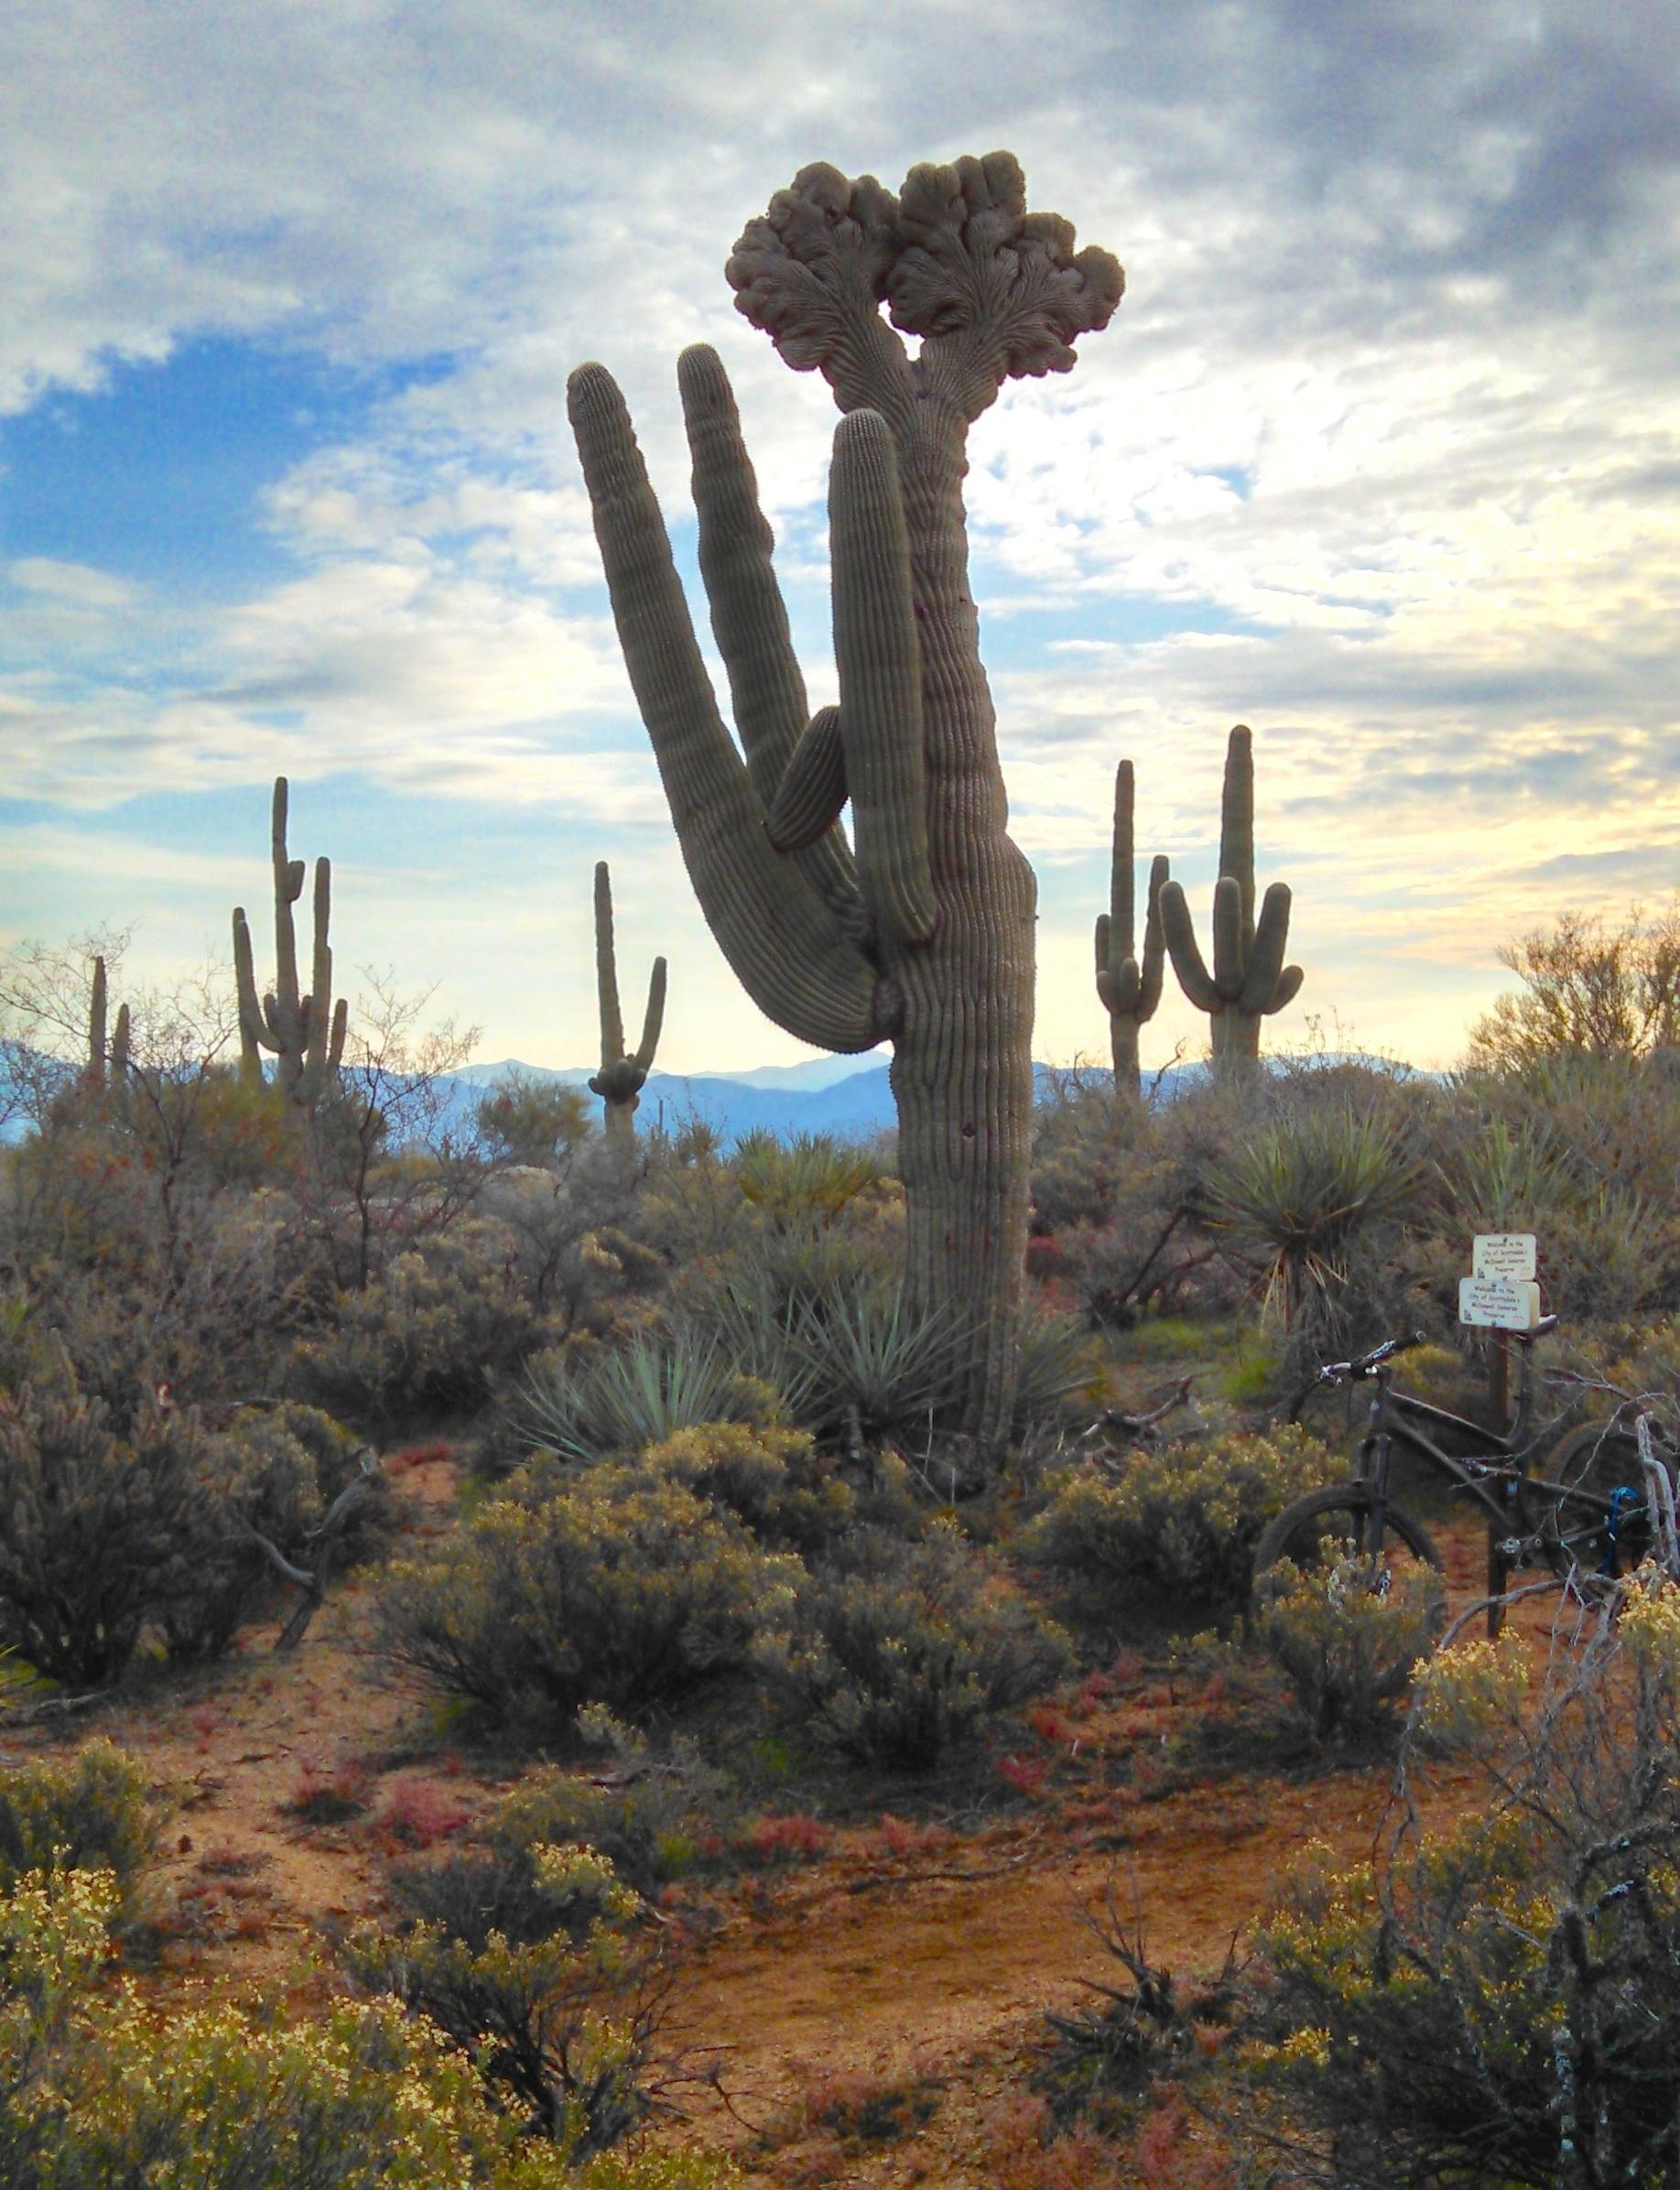 free images landscape tree nature cactus desert flower